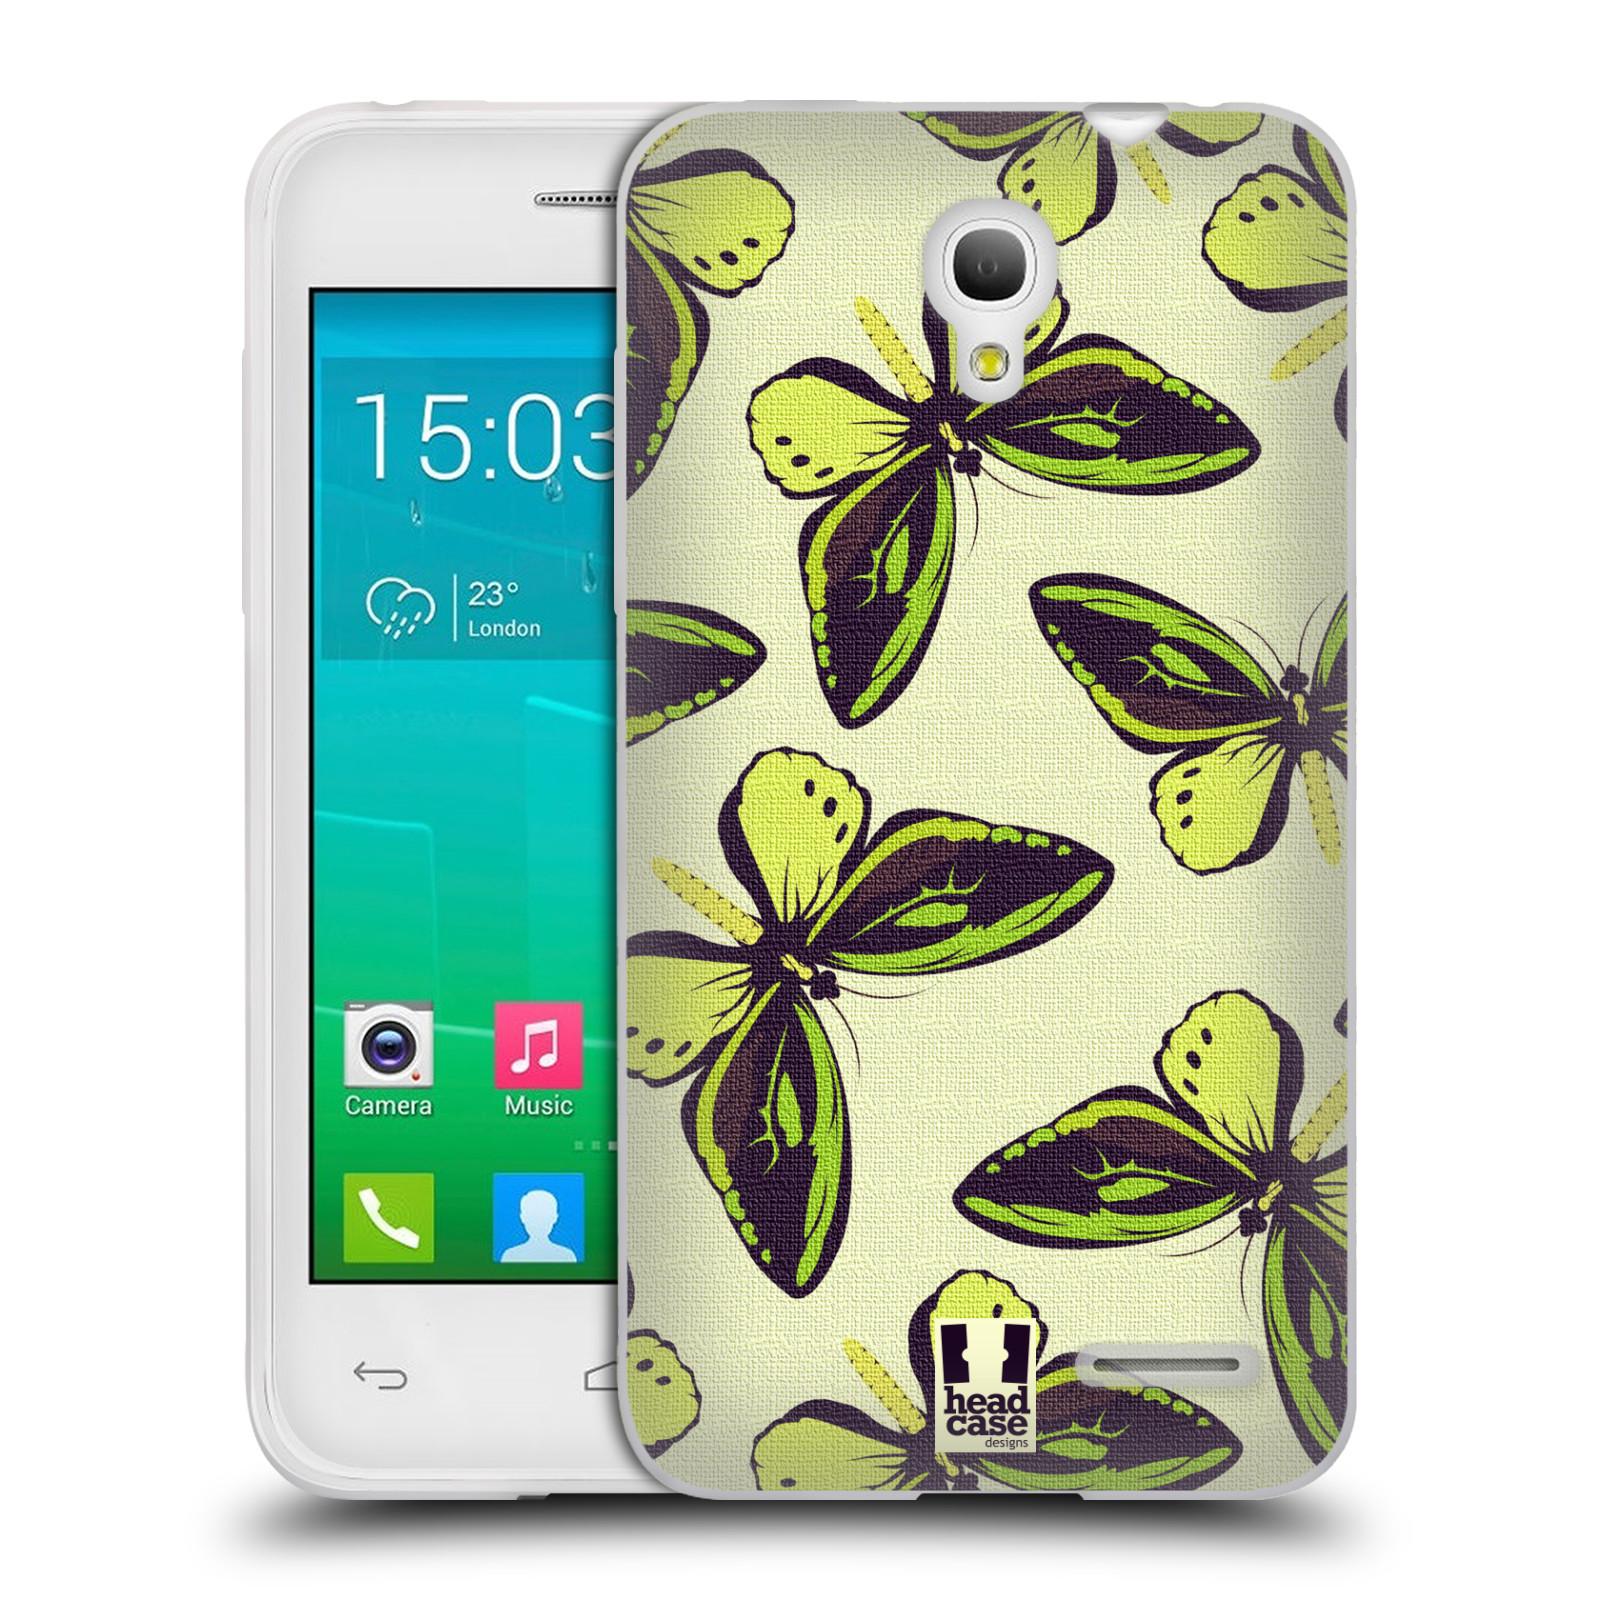 HEAD CASE silikonový obal na mobil Alcatel POP S3 OT-5050Y vzor Motýlci Poseidon zelená